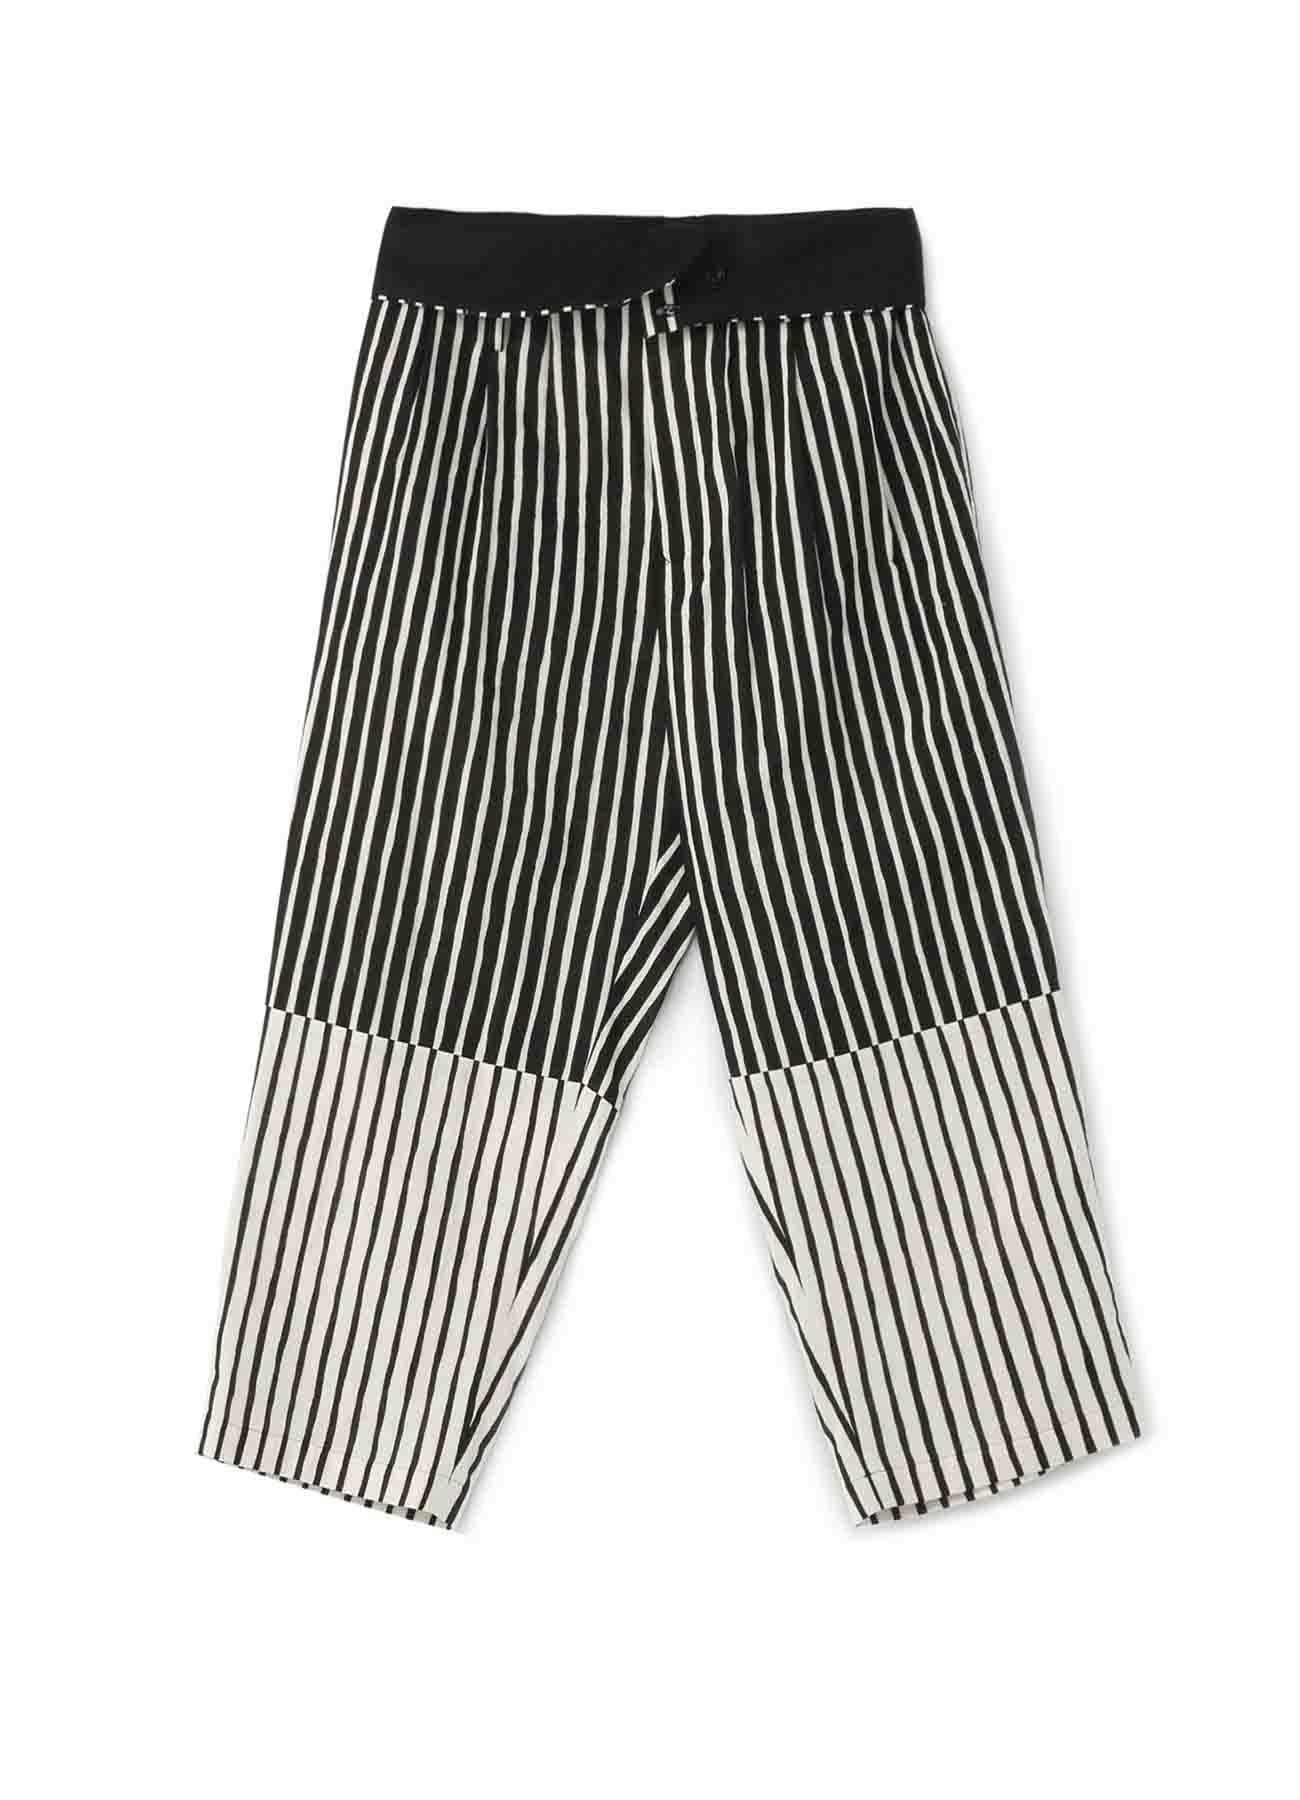 Two-Tone Stripe Panel 3Tuck High Waist Pants